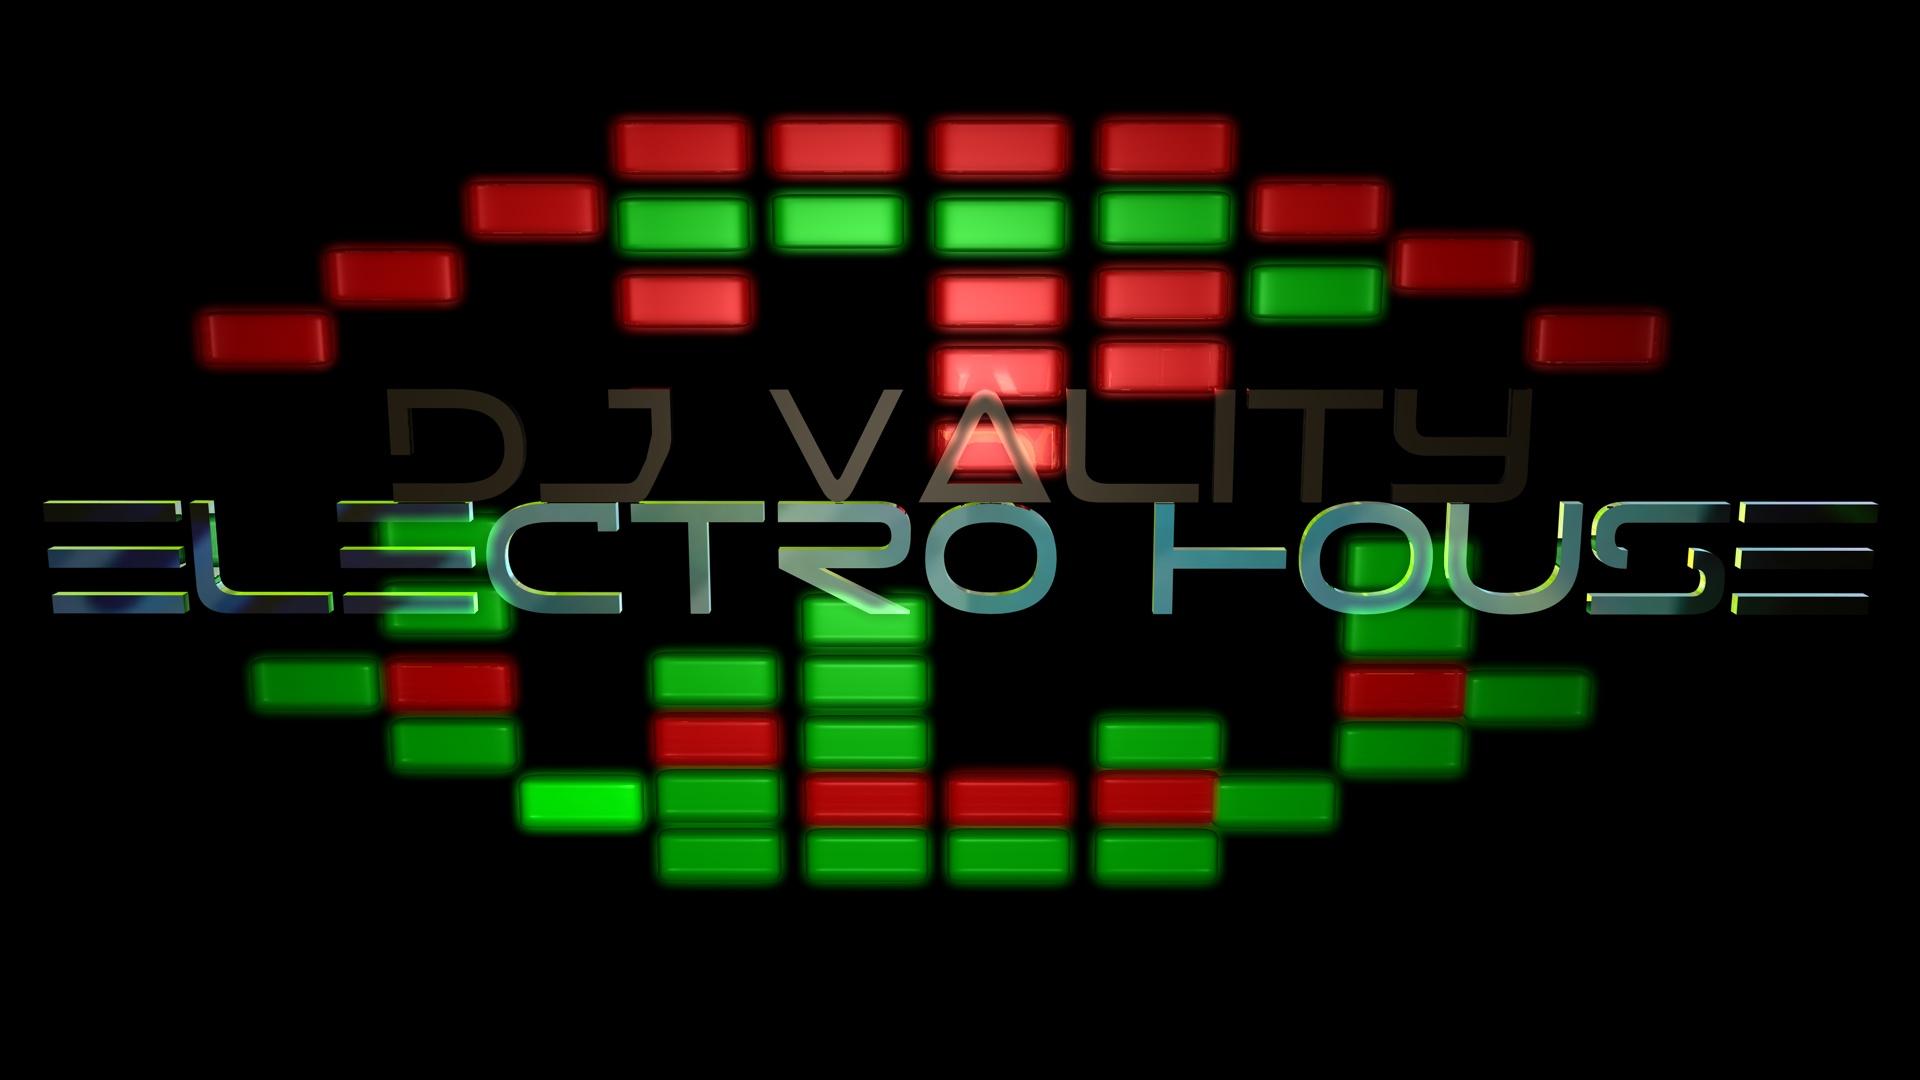 DJ Vality 3D Wallpaper 5 Vetor   ForWallpapercom 1920x1080